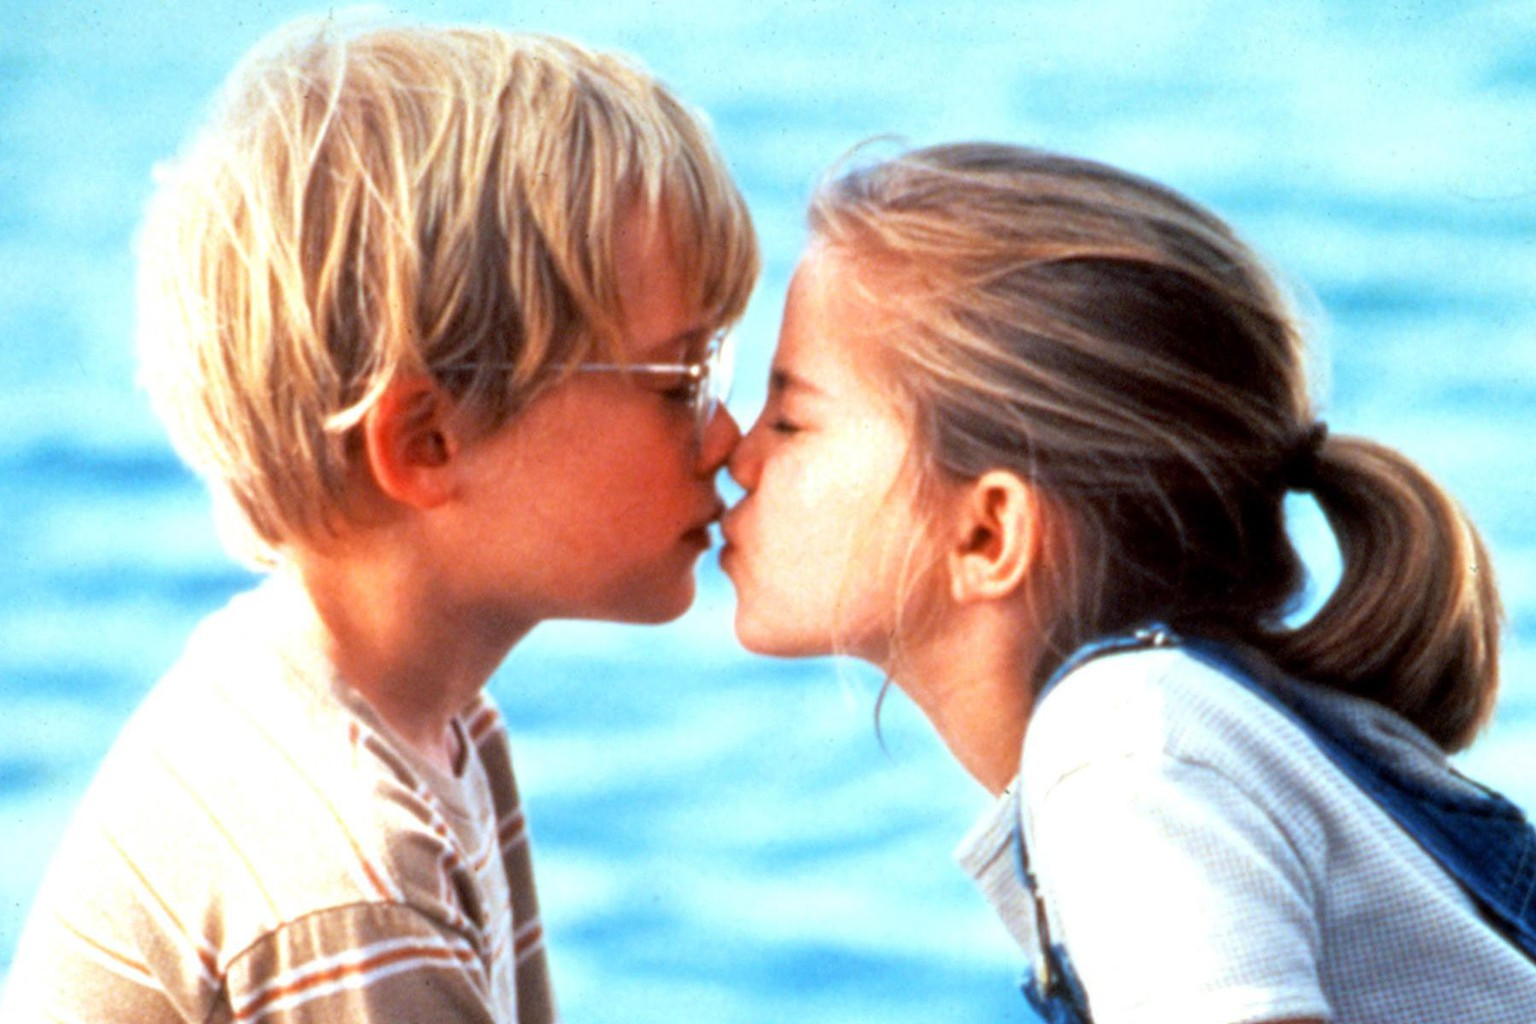 beste freundin nach kuss fragen